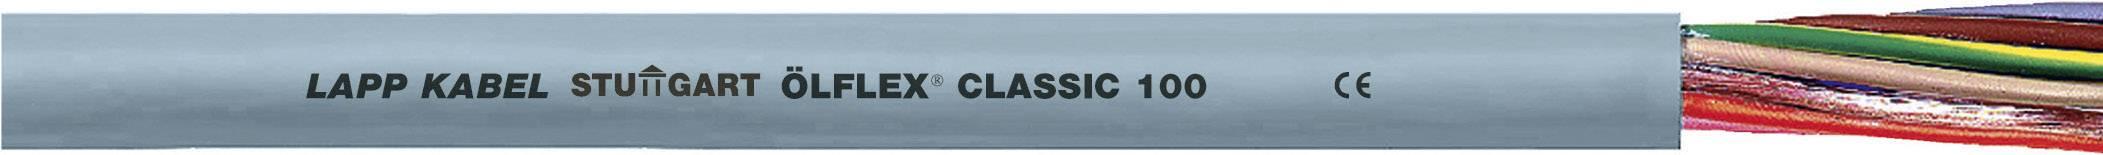 Kabel LappKabel Ölflex CLASSIC 100 25G1,5 (0010076), PVC, 16,9 mm, 500 V, šedá, 100 m